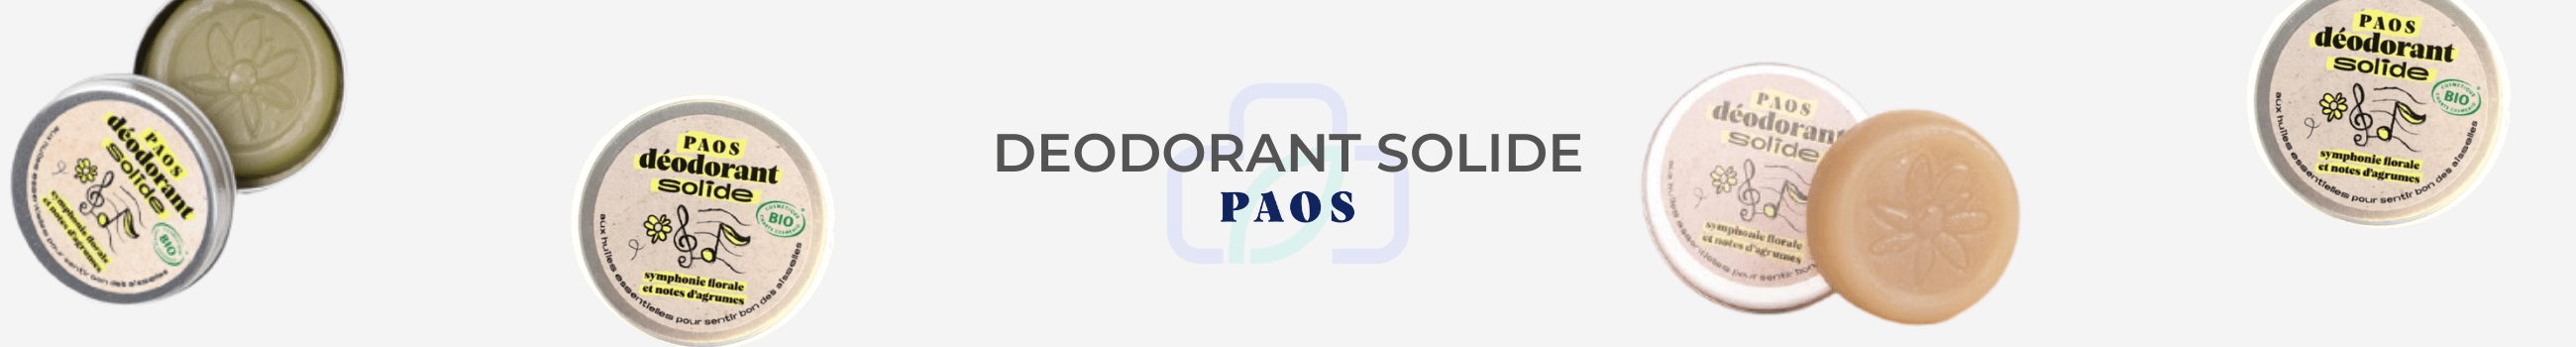 BANNIERE PAOS DEODORANT SOLIDE AISSELLE